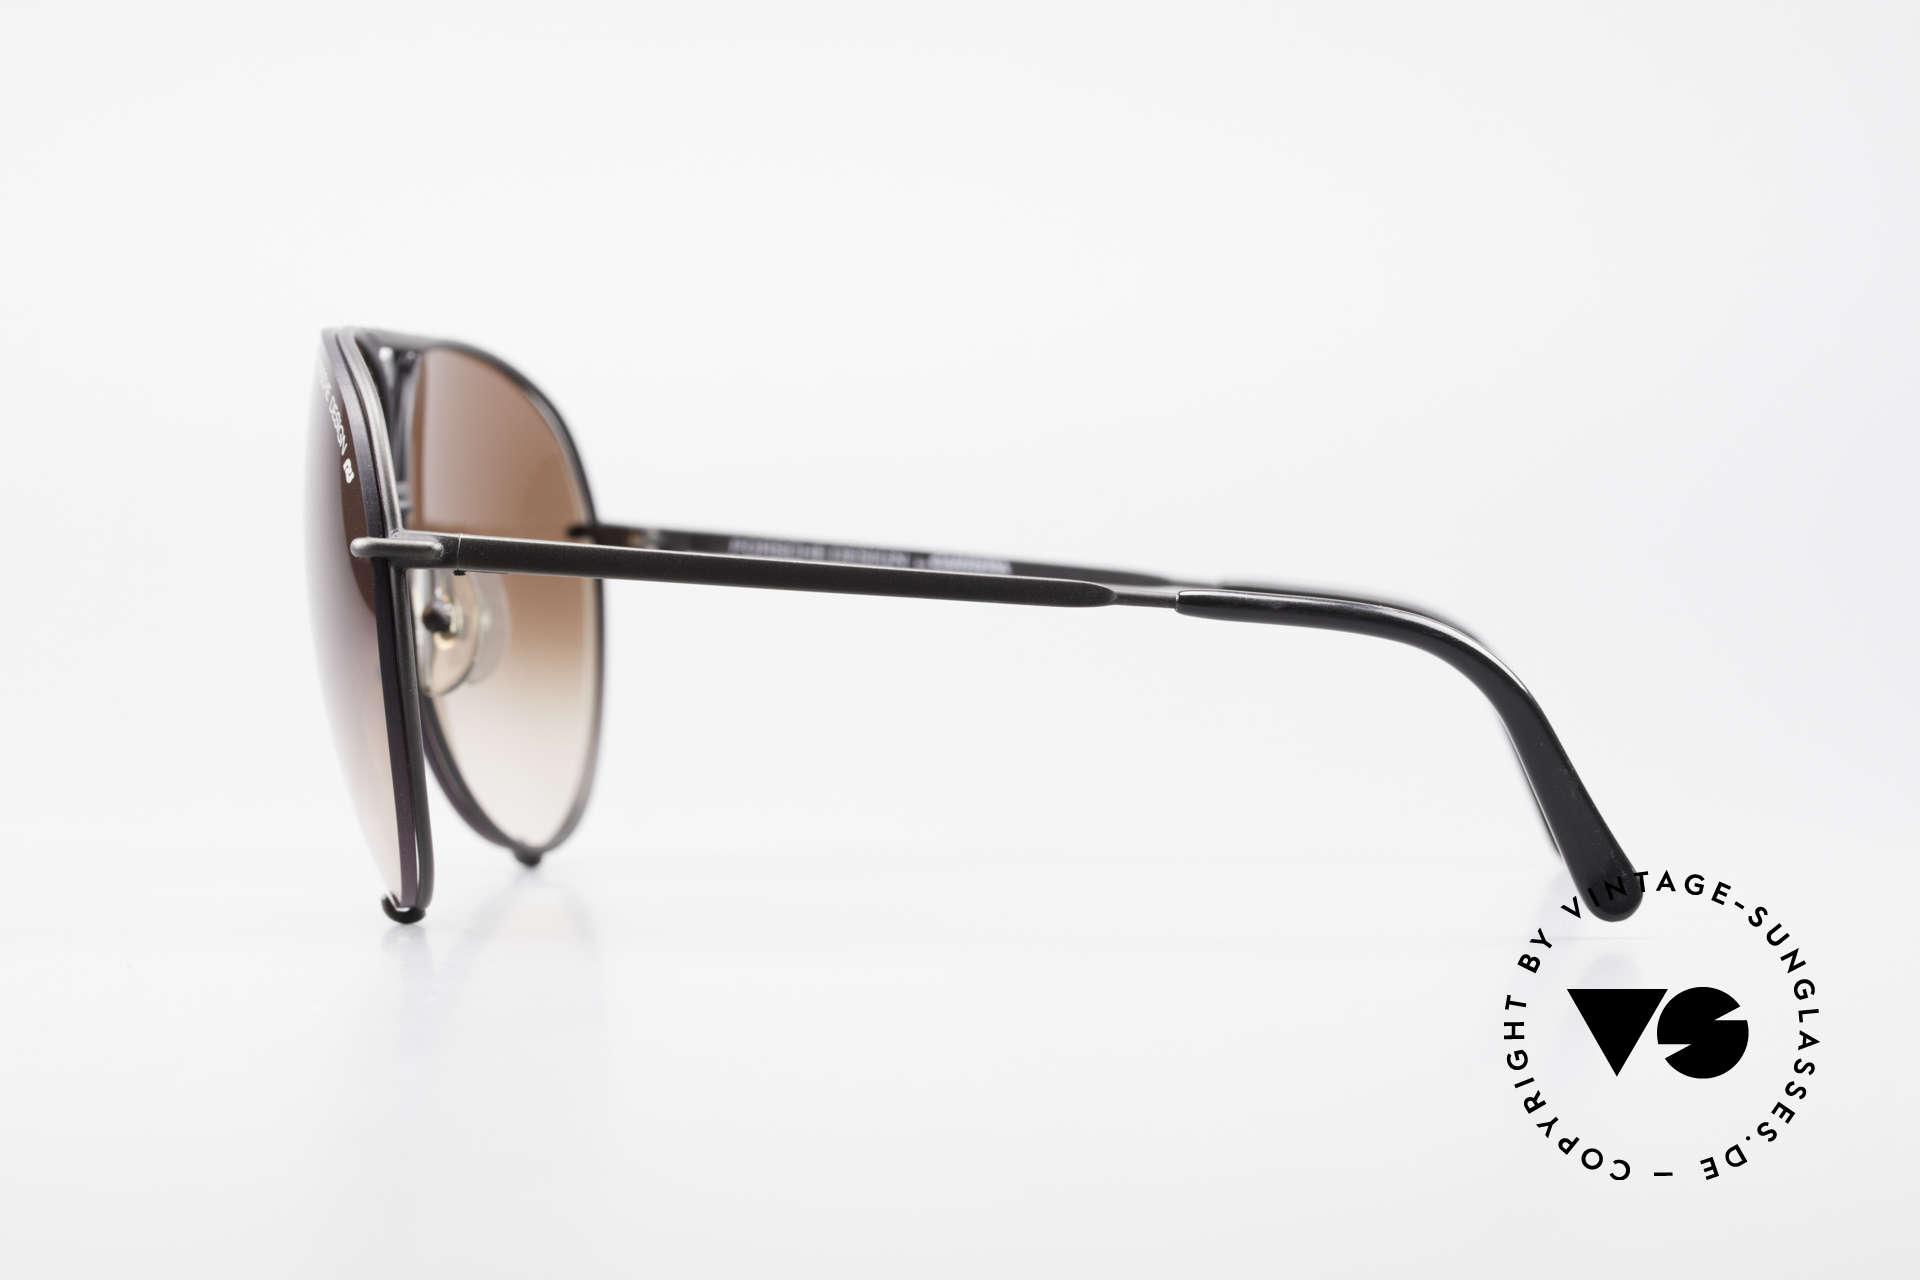 Porsche 5623 True 80's Aviator Sunglasses, matt black frame with 2 sets of lenses (brown & gray), Made for Men and Women